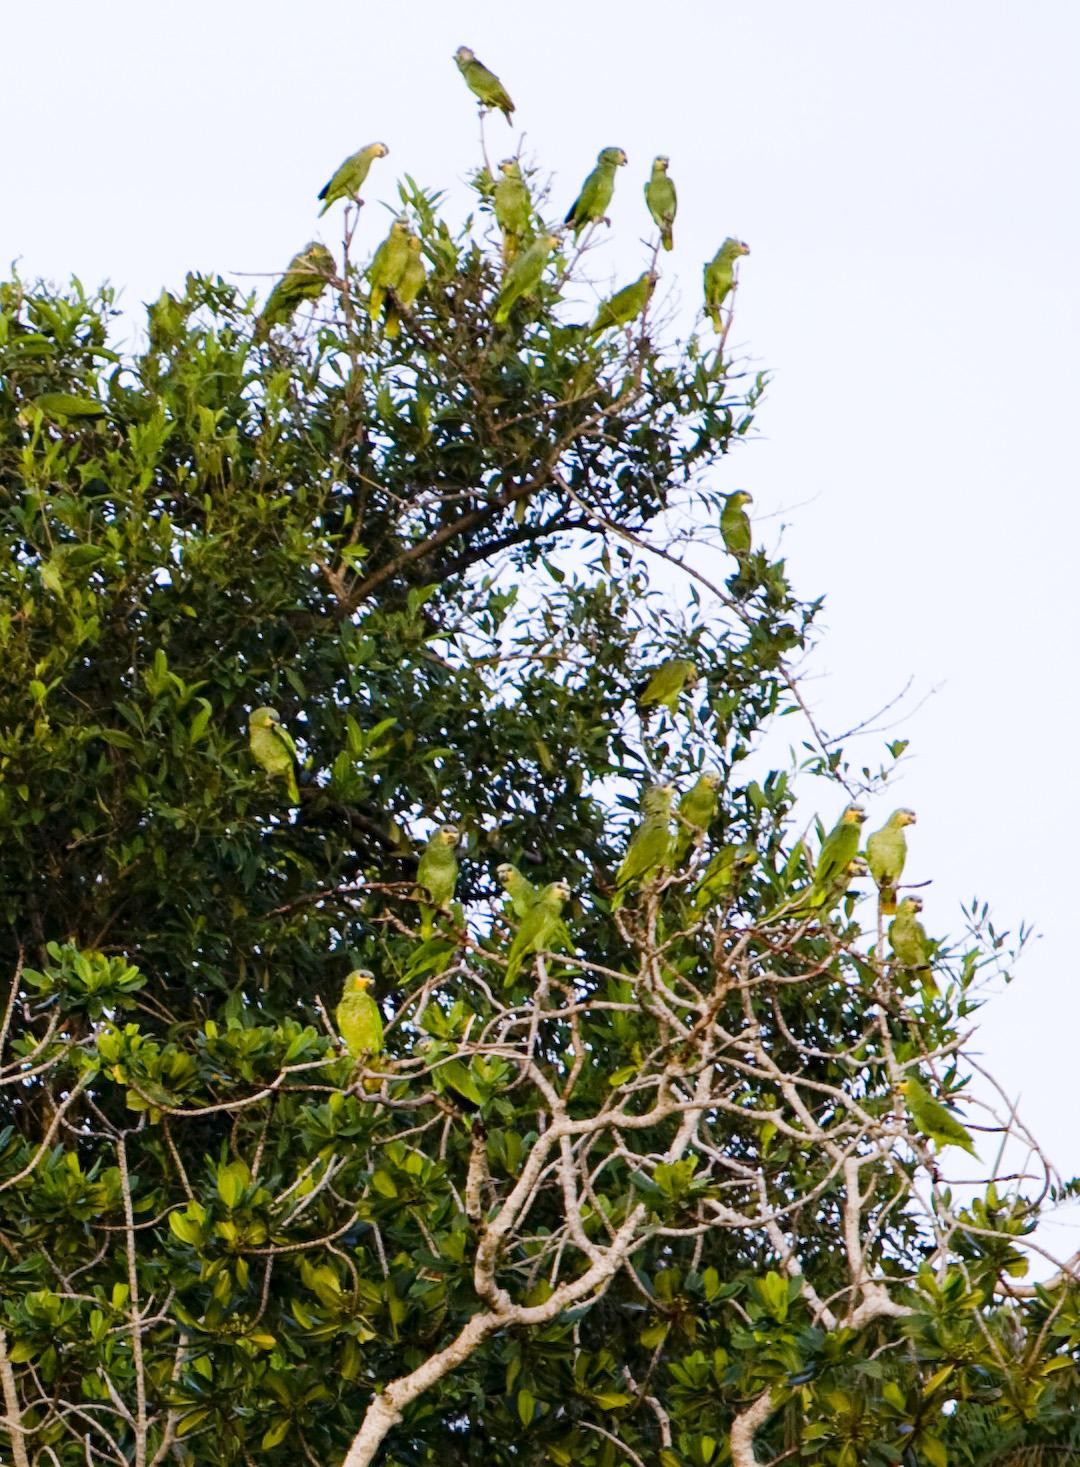 Ilhas do Papagaio